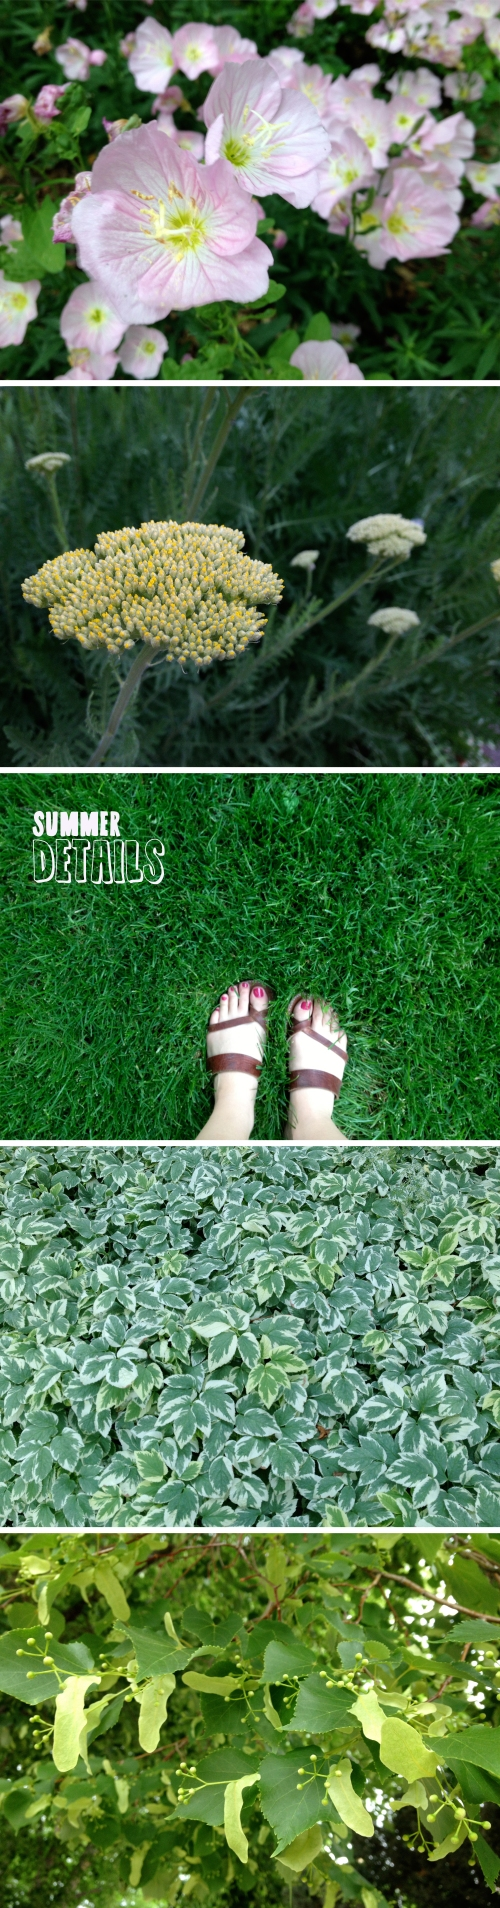 Summer Details